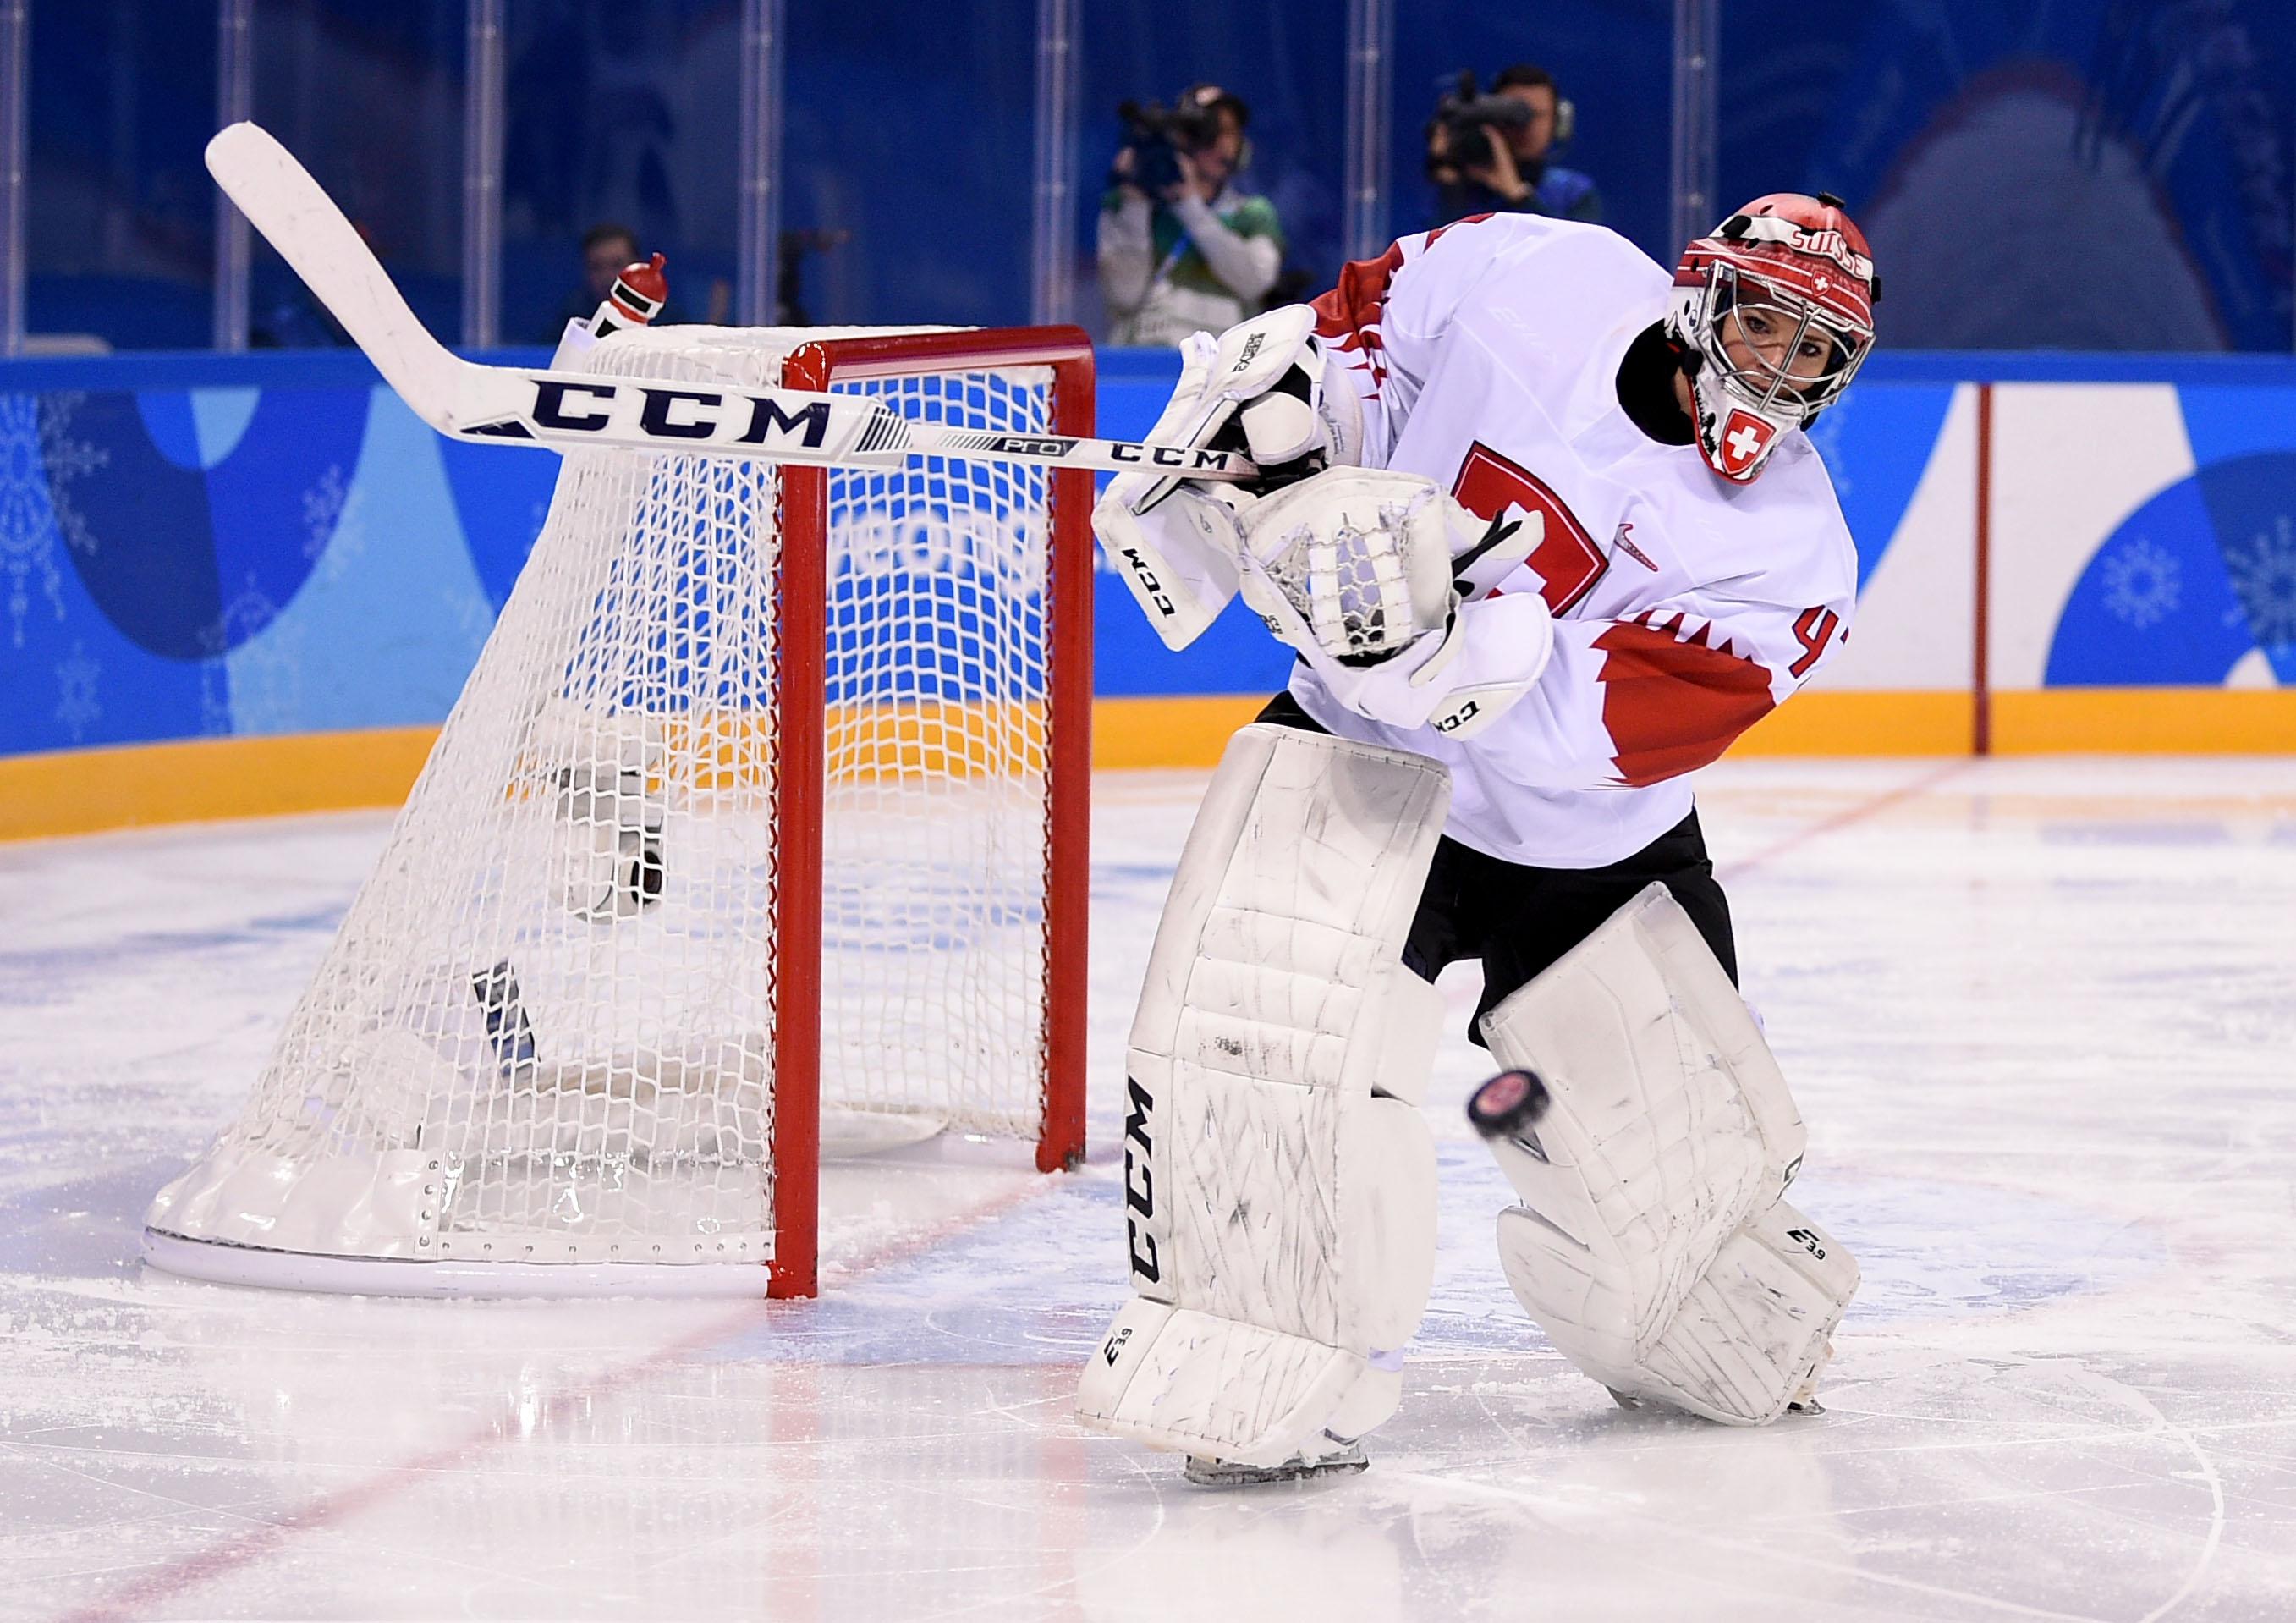 Olympics: Ice Hockey-Women Team Group B - SWE-SUI